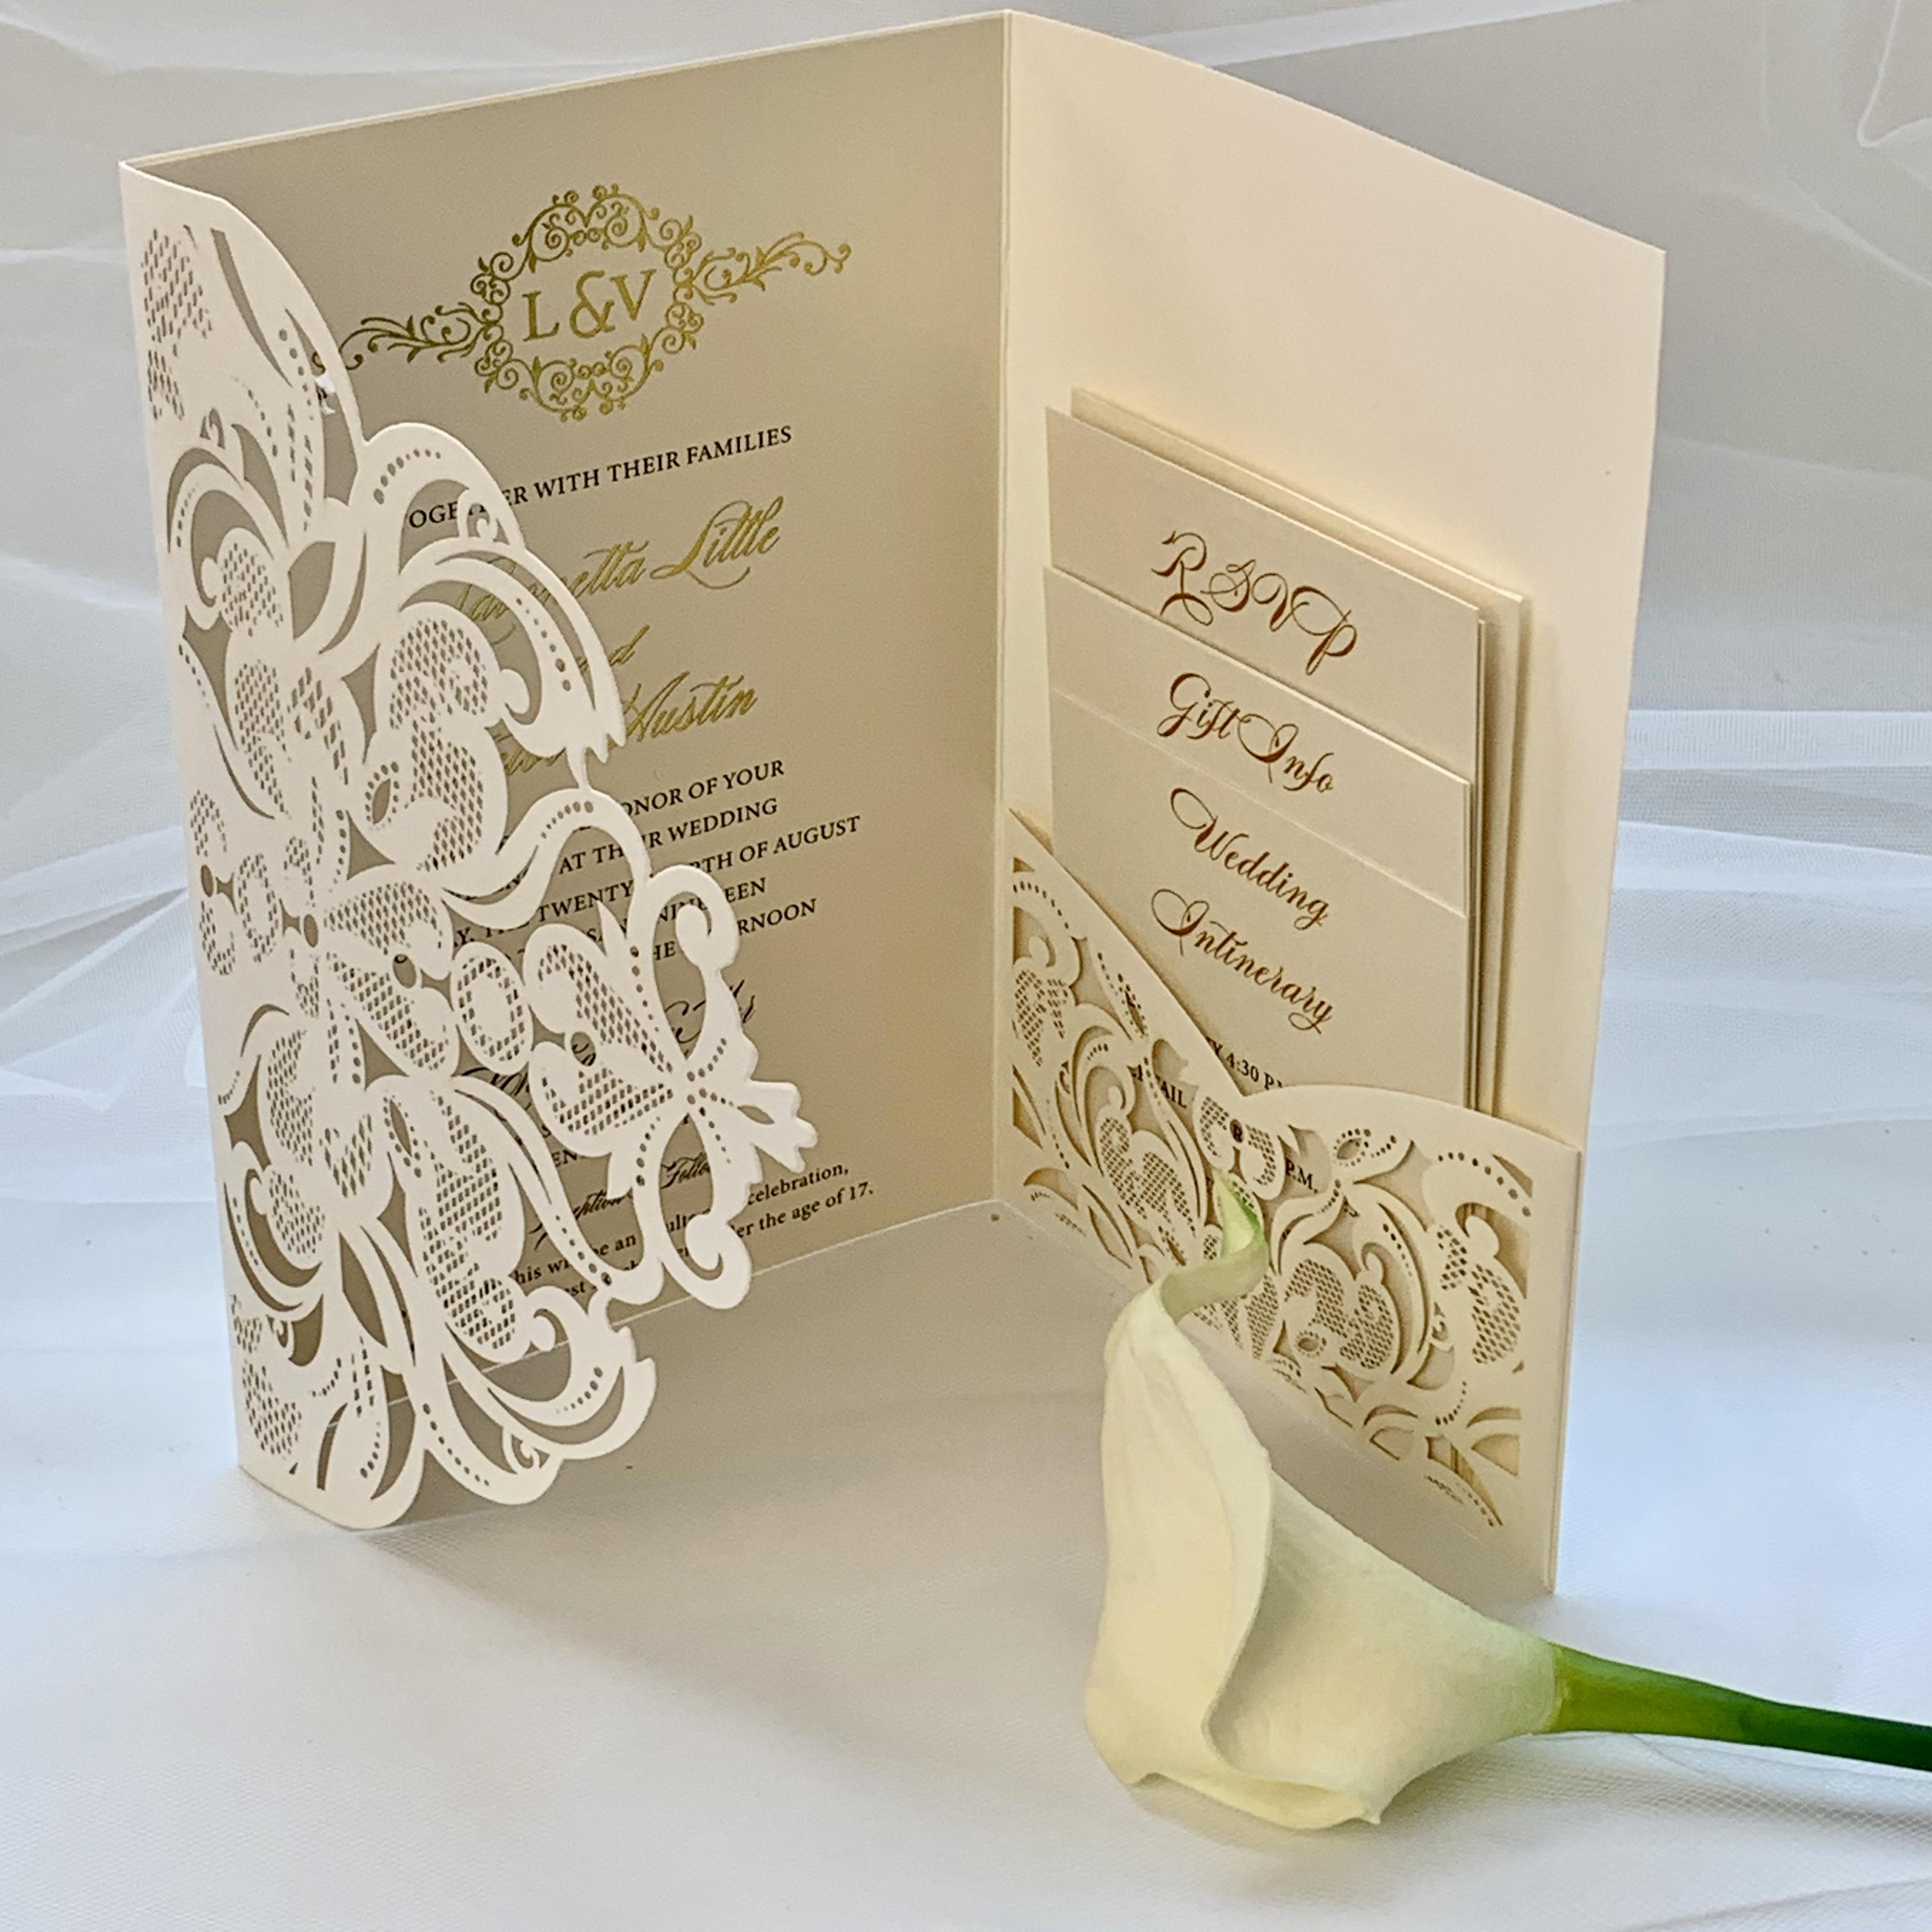 IMG_6166stylish wedding invitations in NYC